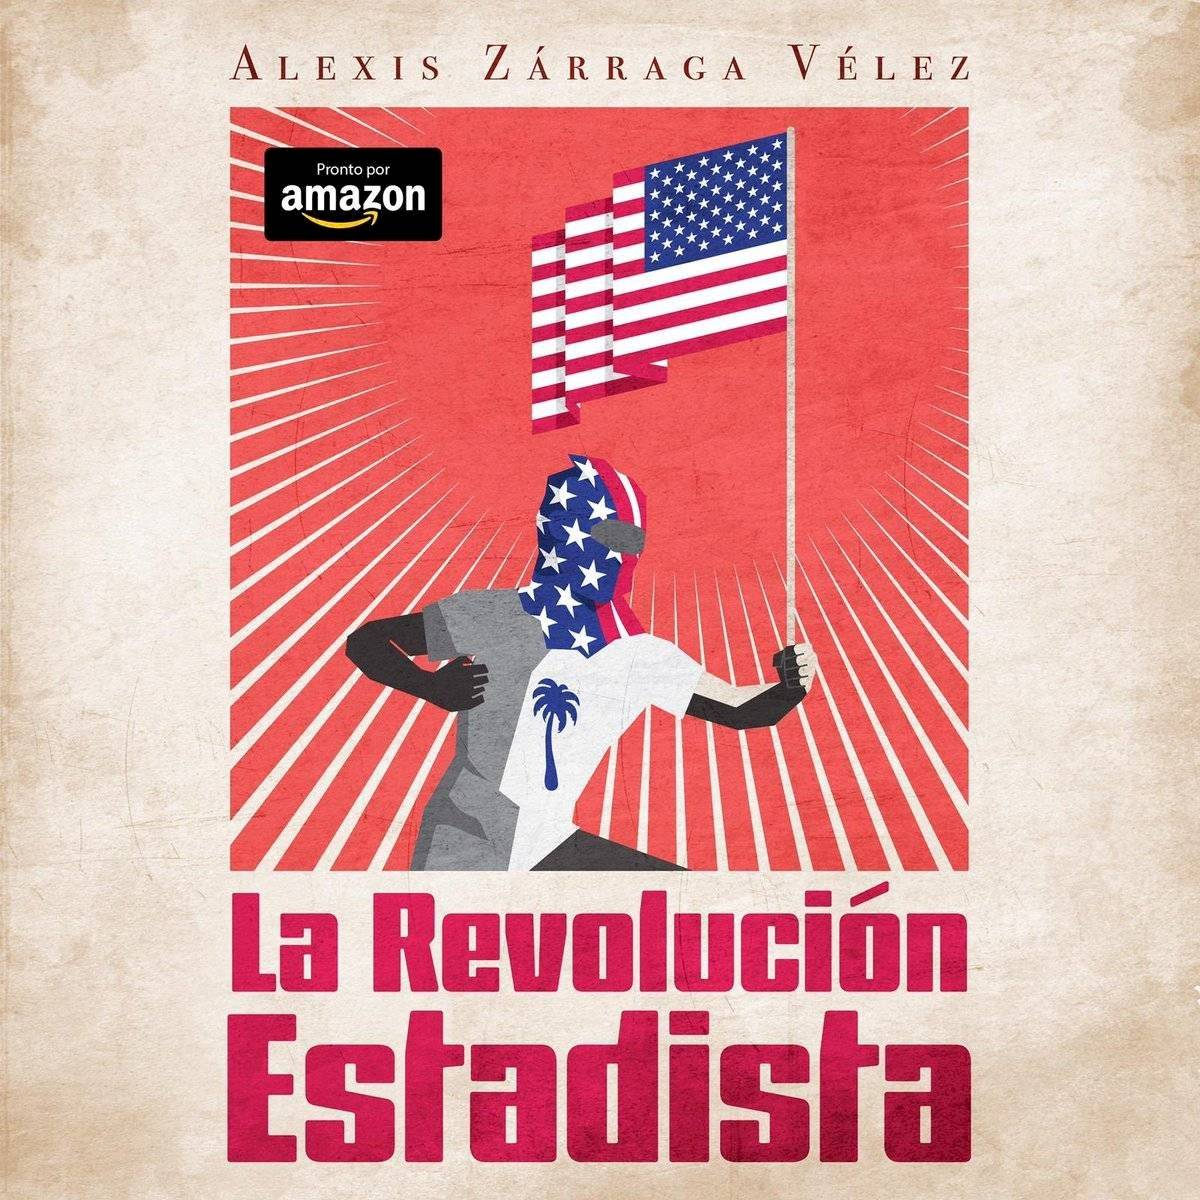 revolucion estadista